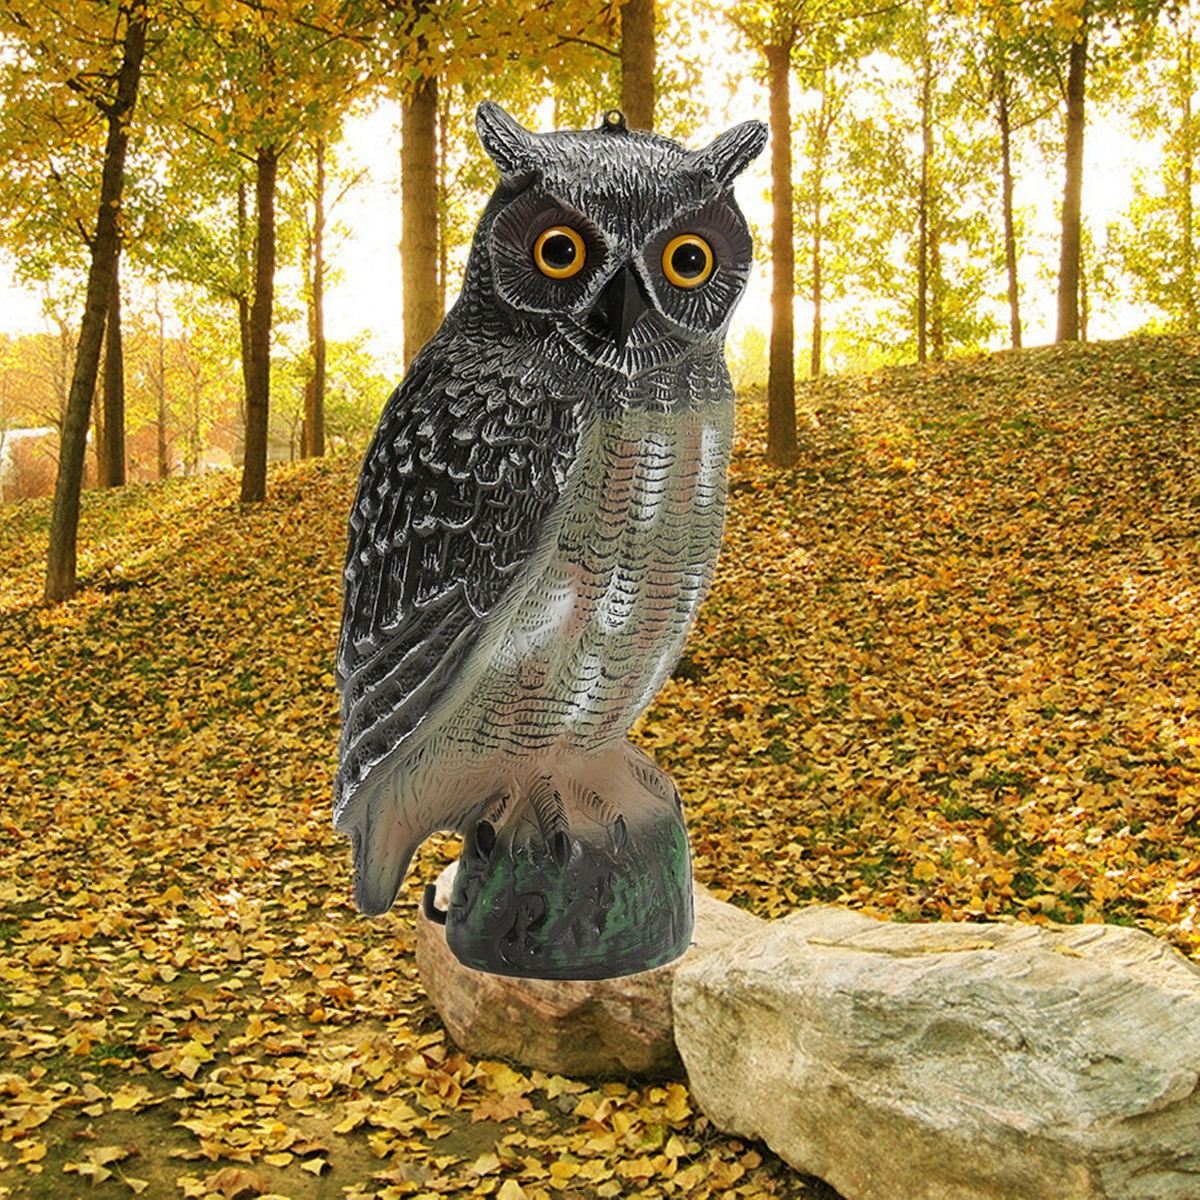 Neue Lebensechte 3D Outdoor Jagd Lockvögel Kunststoff Gefälschte Eule Garten Decor Ornamente Für Jagd Decoy Scarer Scarecrow Vogel Anrufer